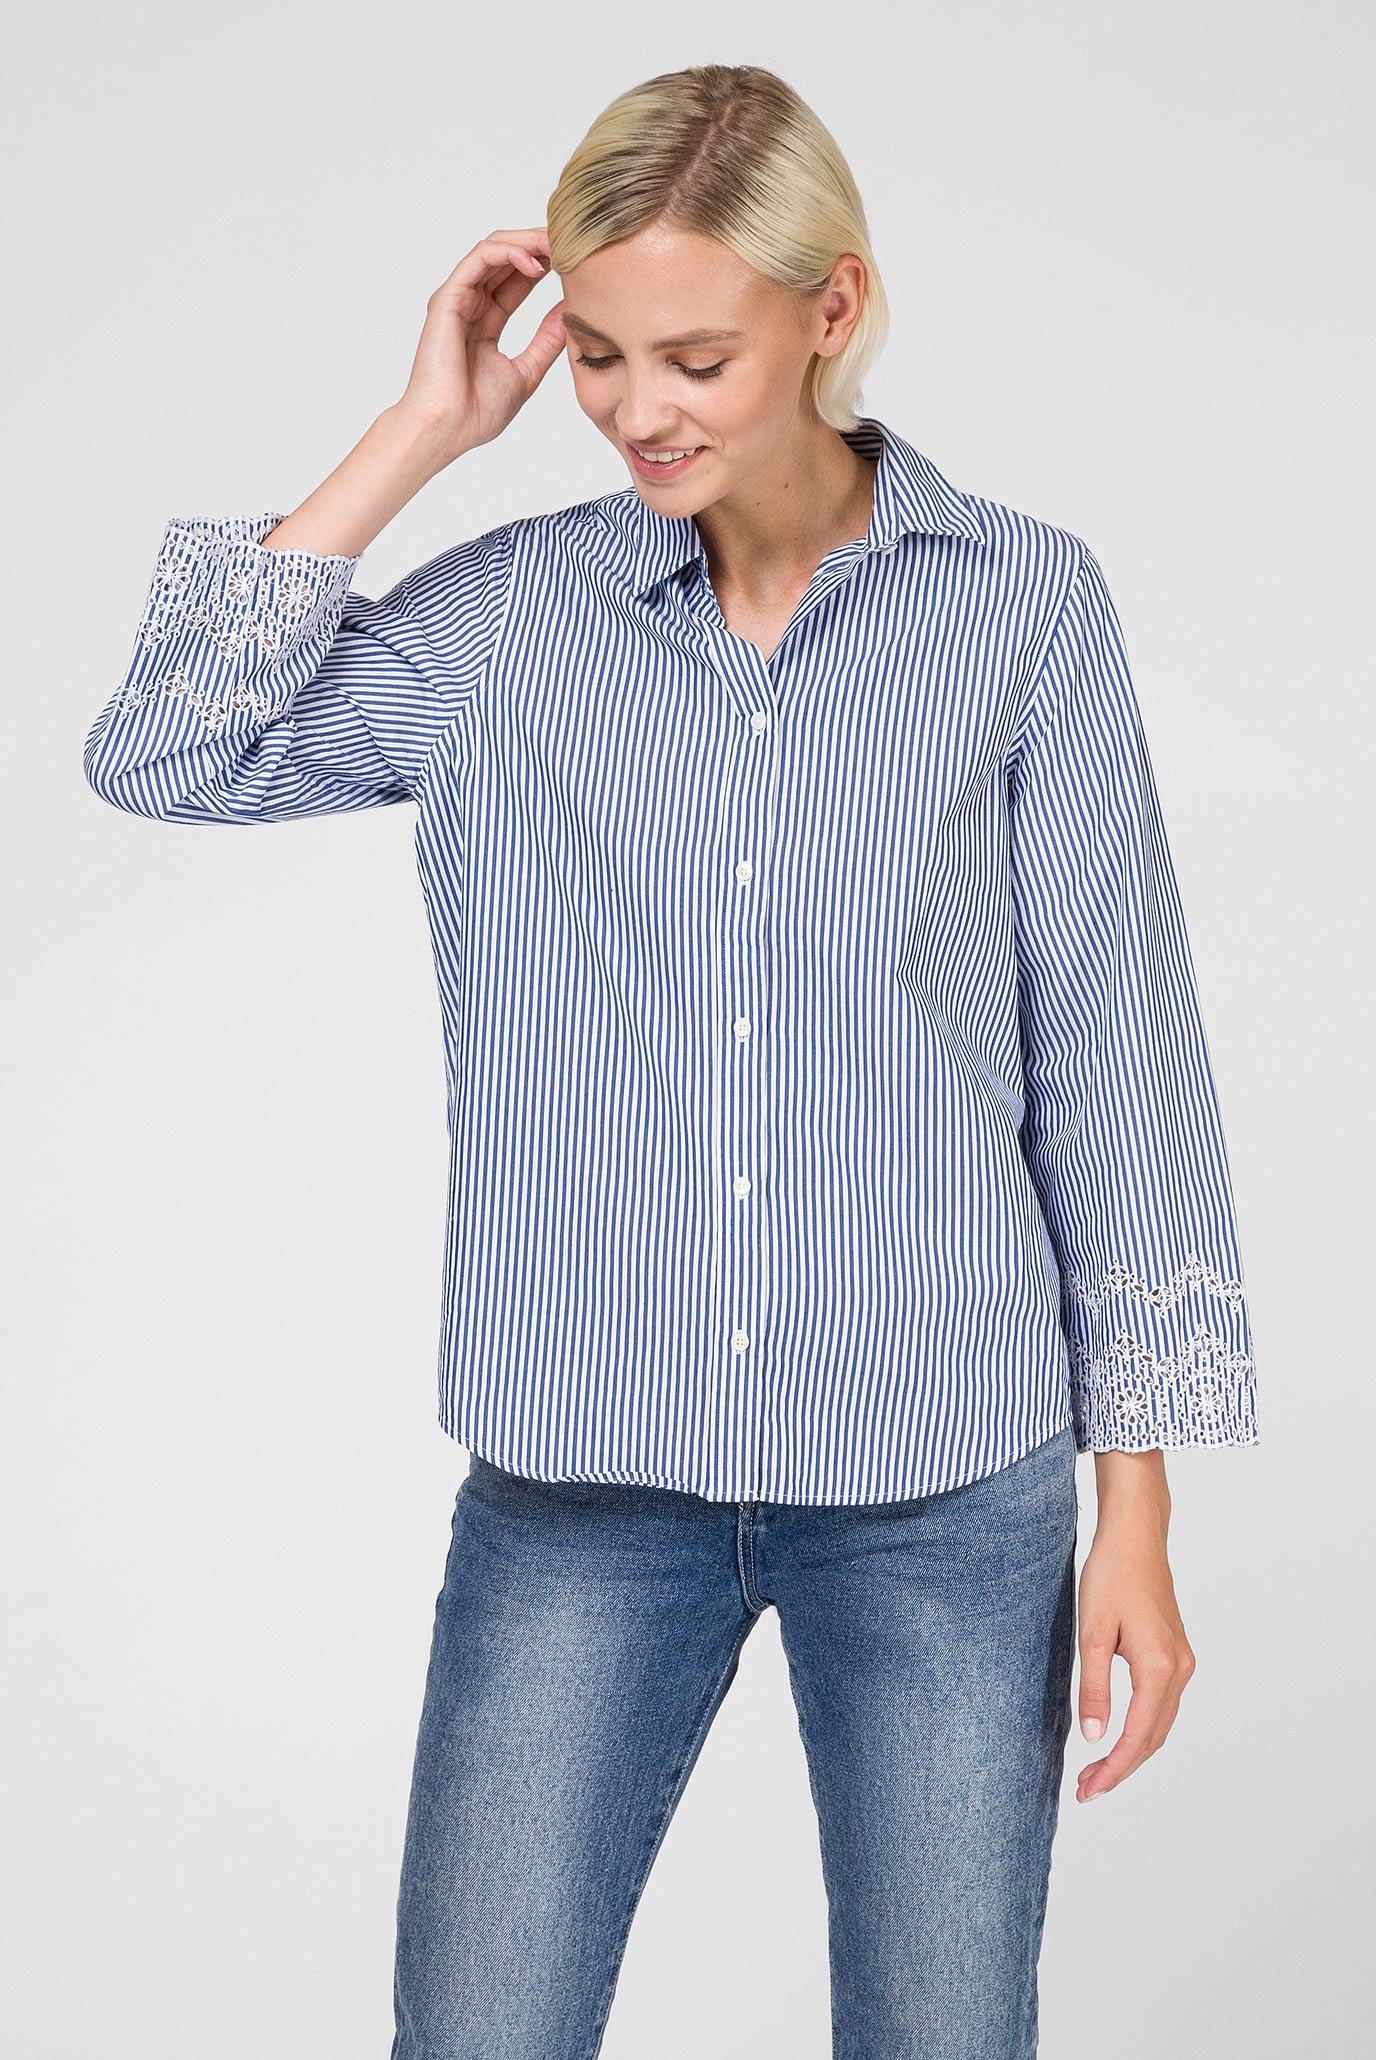 Женская синяя блуза в полоску BRODERIE ANGLAISE SHIRT Gant